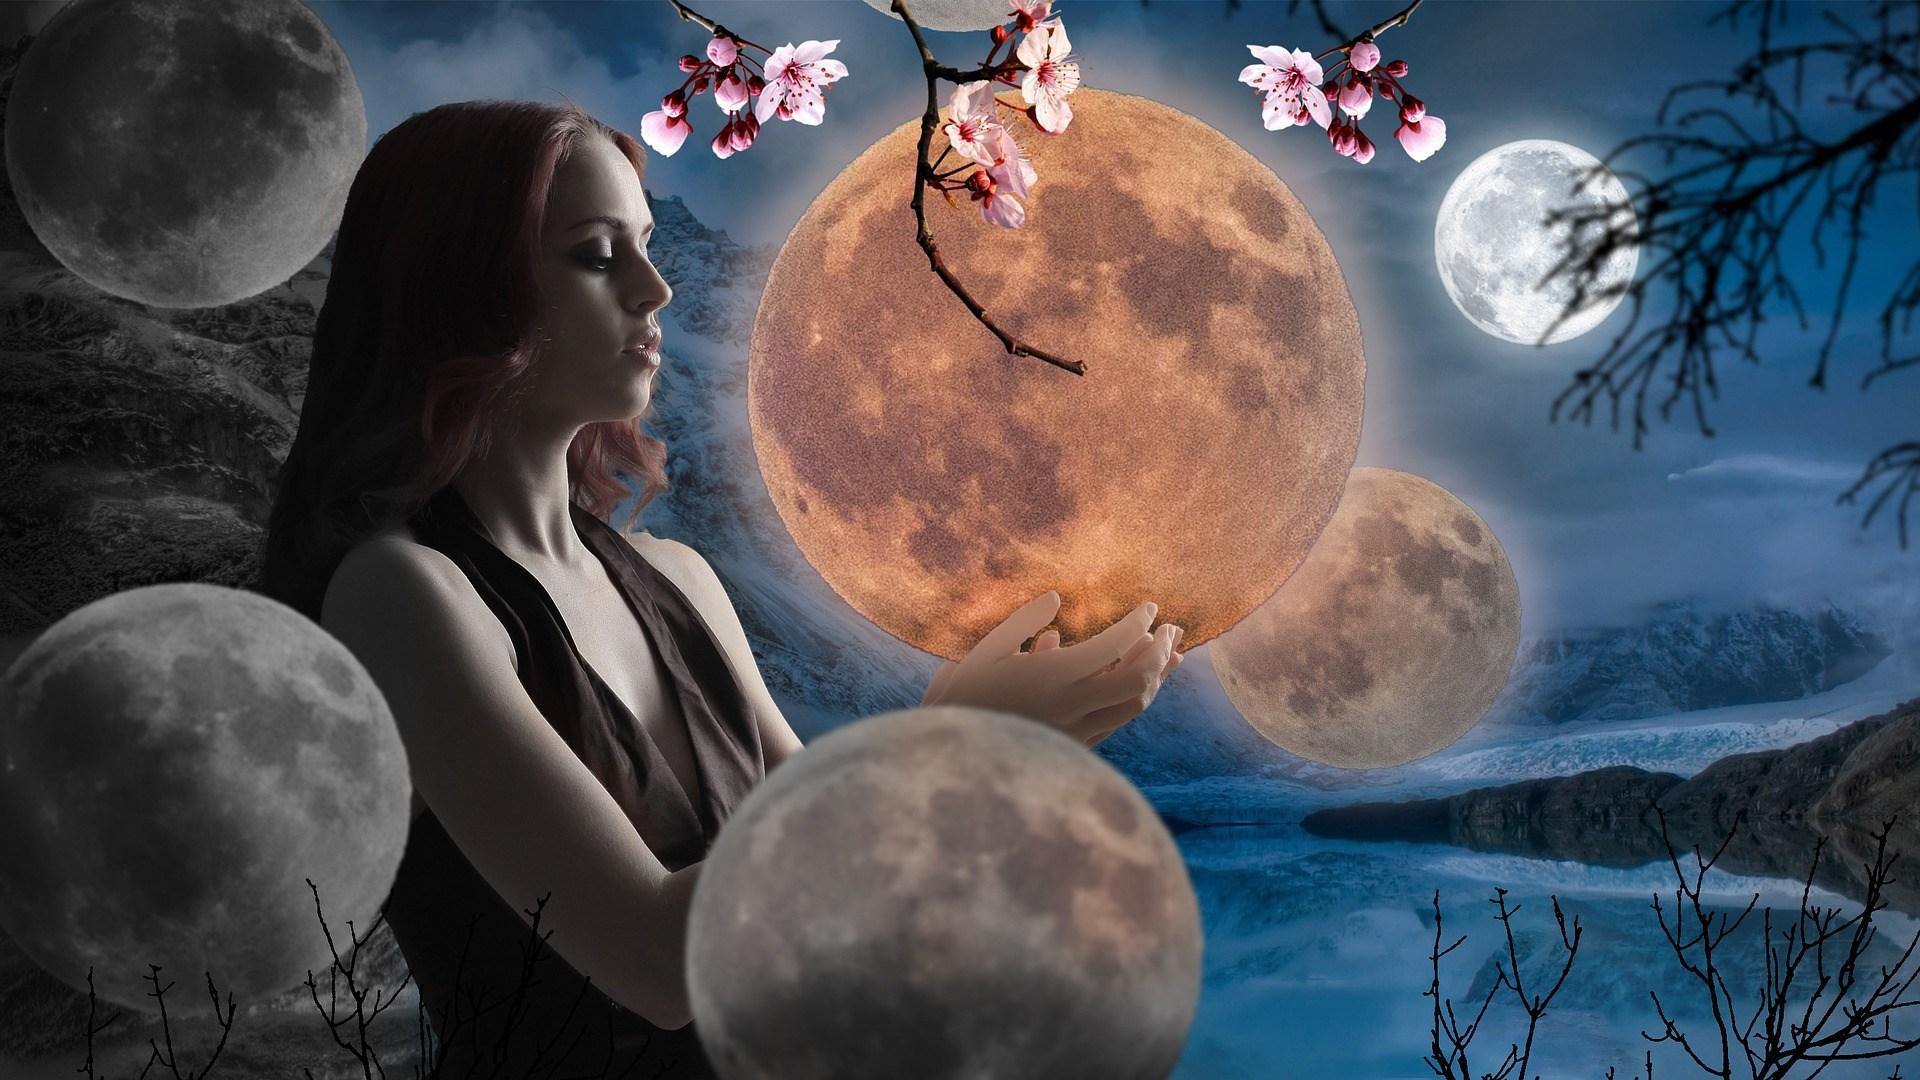 Когда Полнолуние в апреле 2019 года: точная дата, время, знак Зодиака